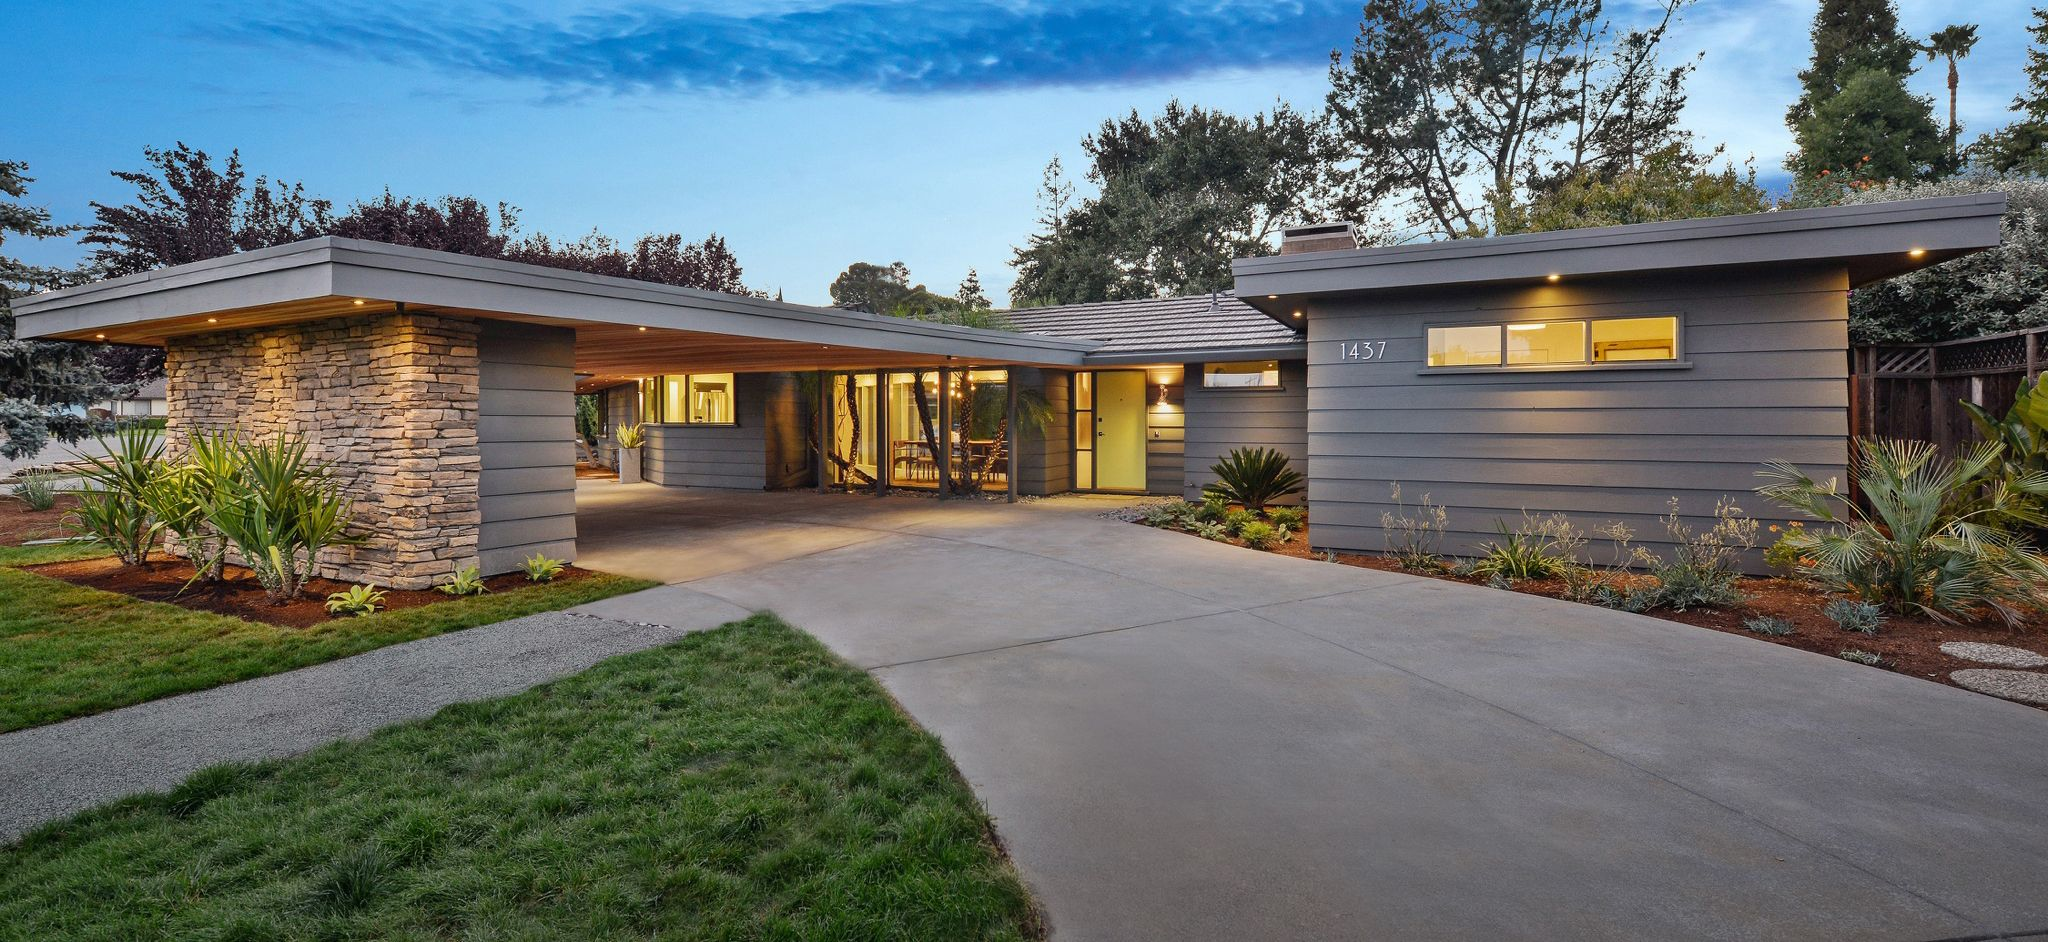 WEAVER DRIVE | Renovation, Ranch remodel, House